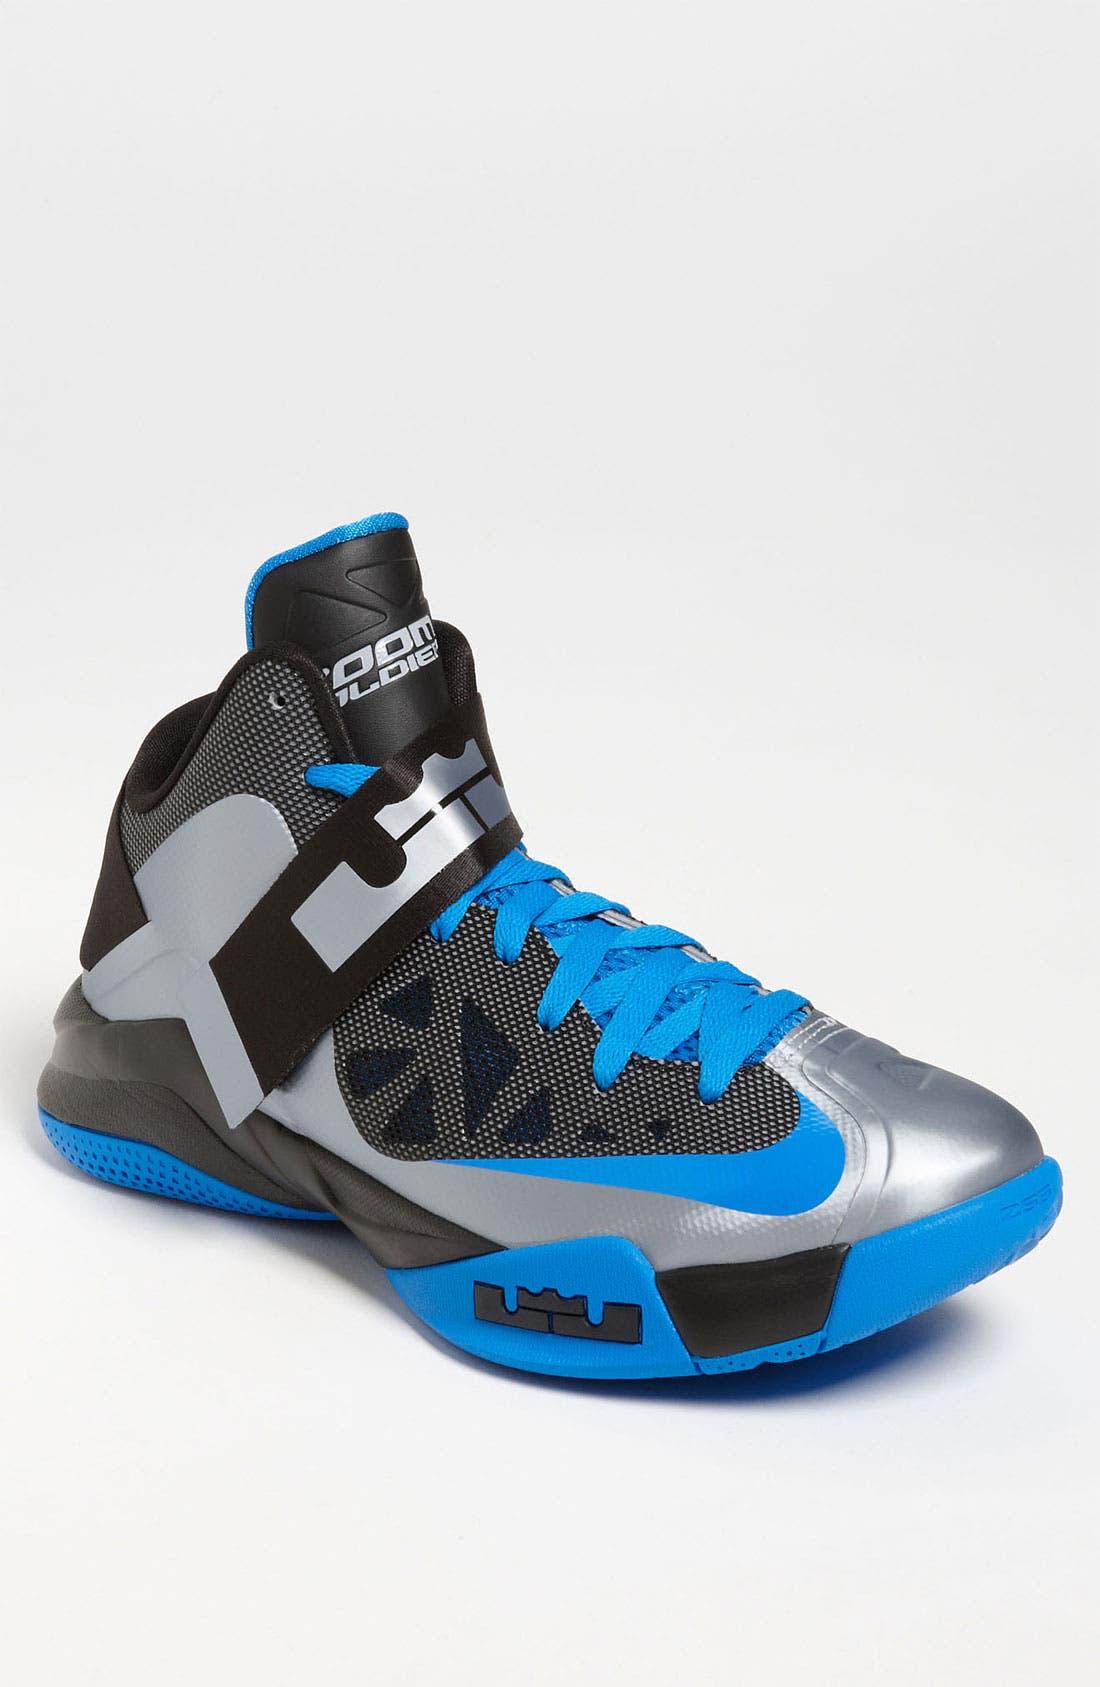 Alternate Image 1 Selected - Nike 'Zoom Soldier VI' Basketball Shoe (Men)